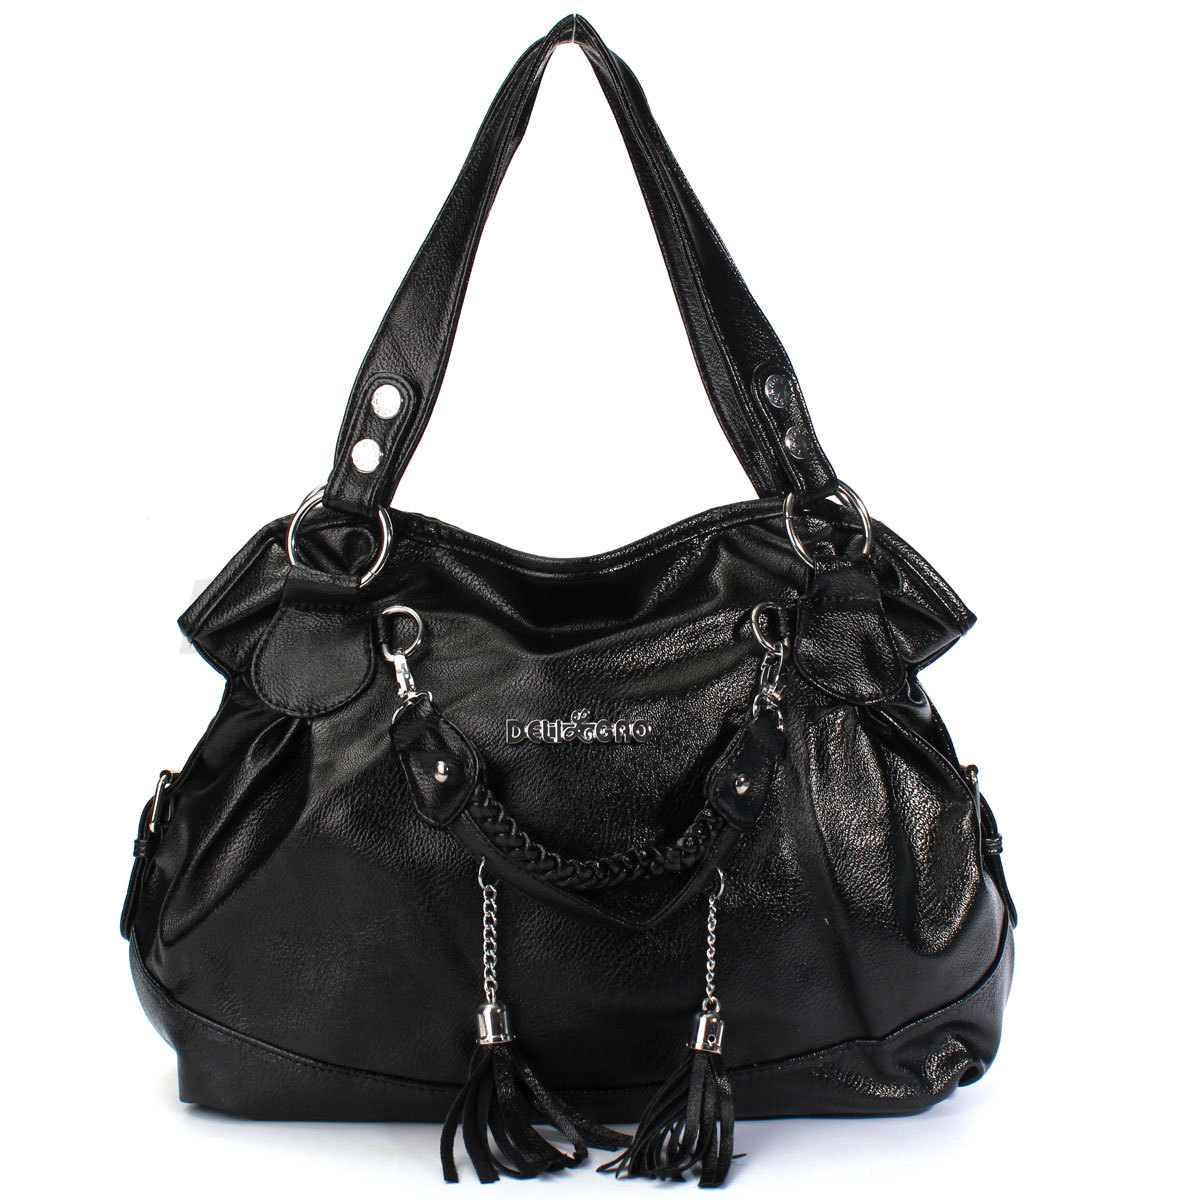 Women PU Leather Tassel Handbag Shoulder Crossbody Bag Tote Purse New Fashion